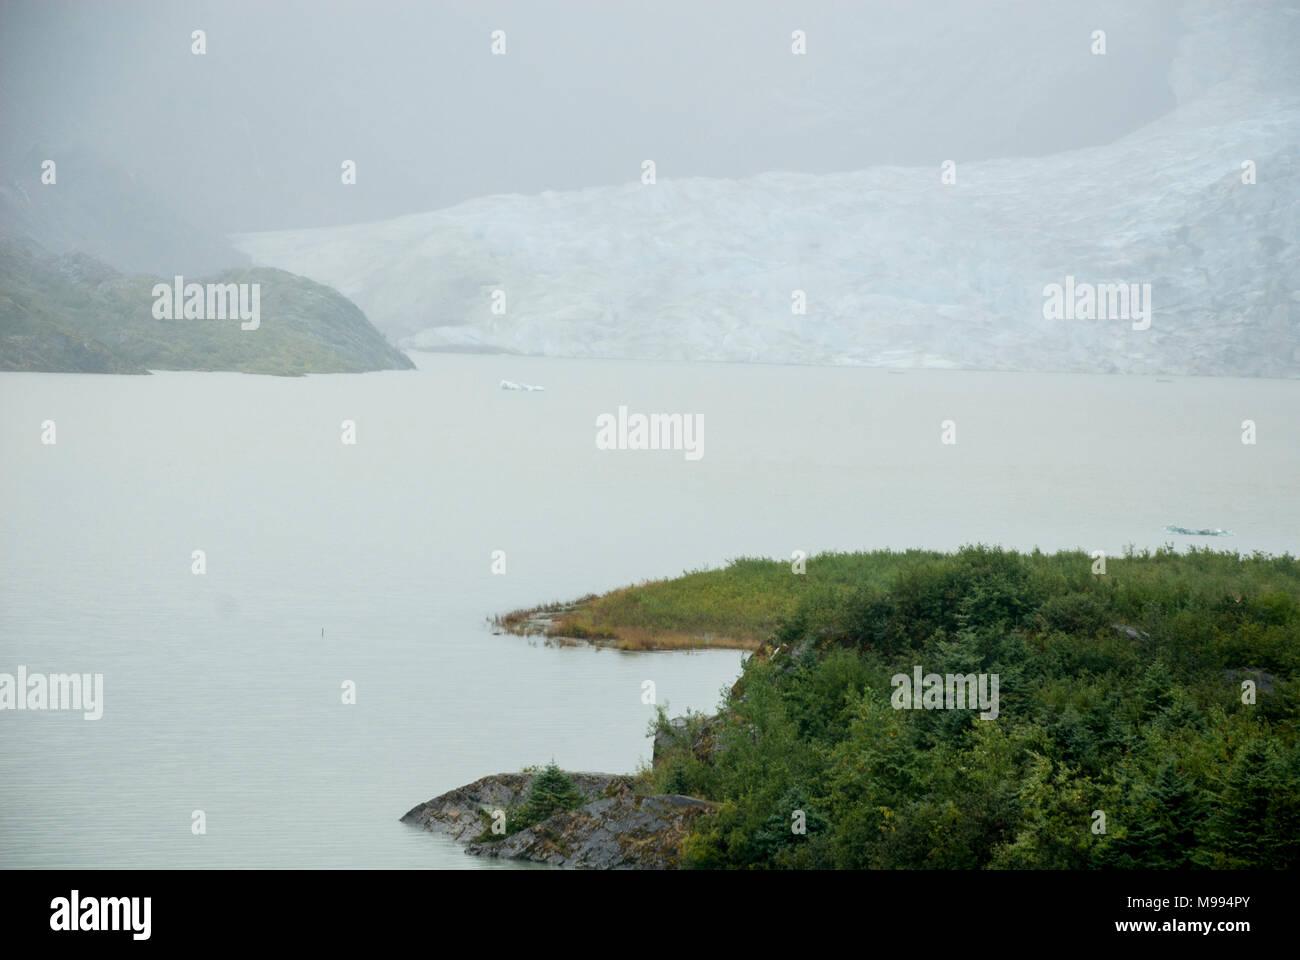 USA Alaska, Tongass National Forest, Mendenhall Glacier Recreation Area, Travel destination - Stock Image